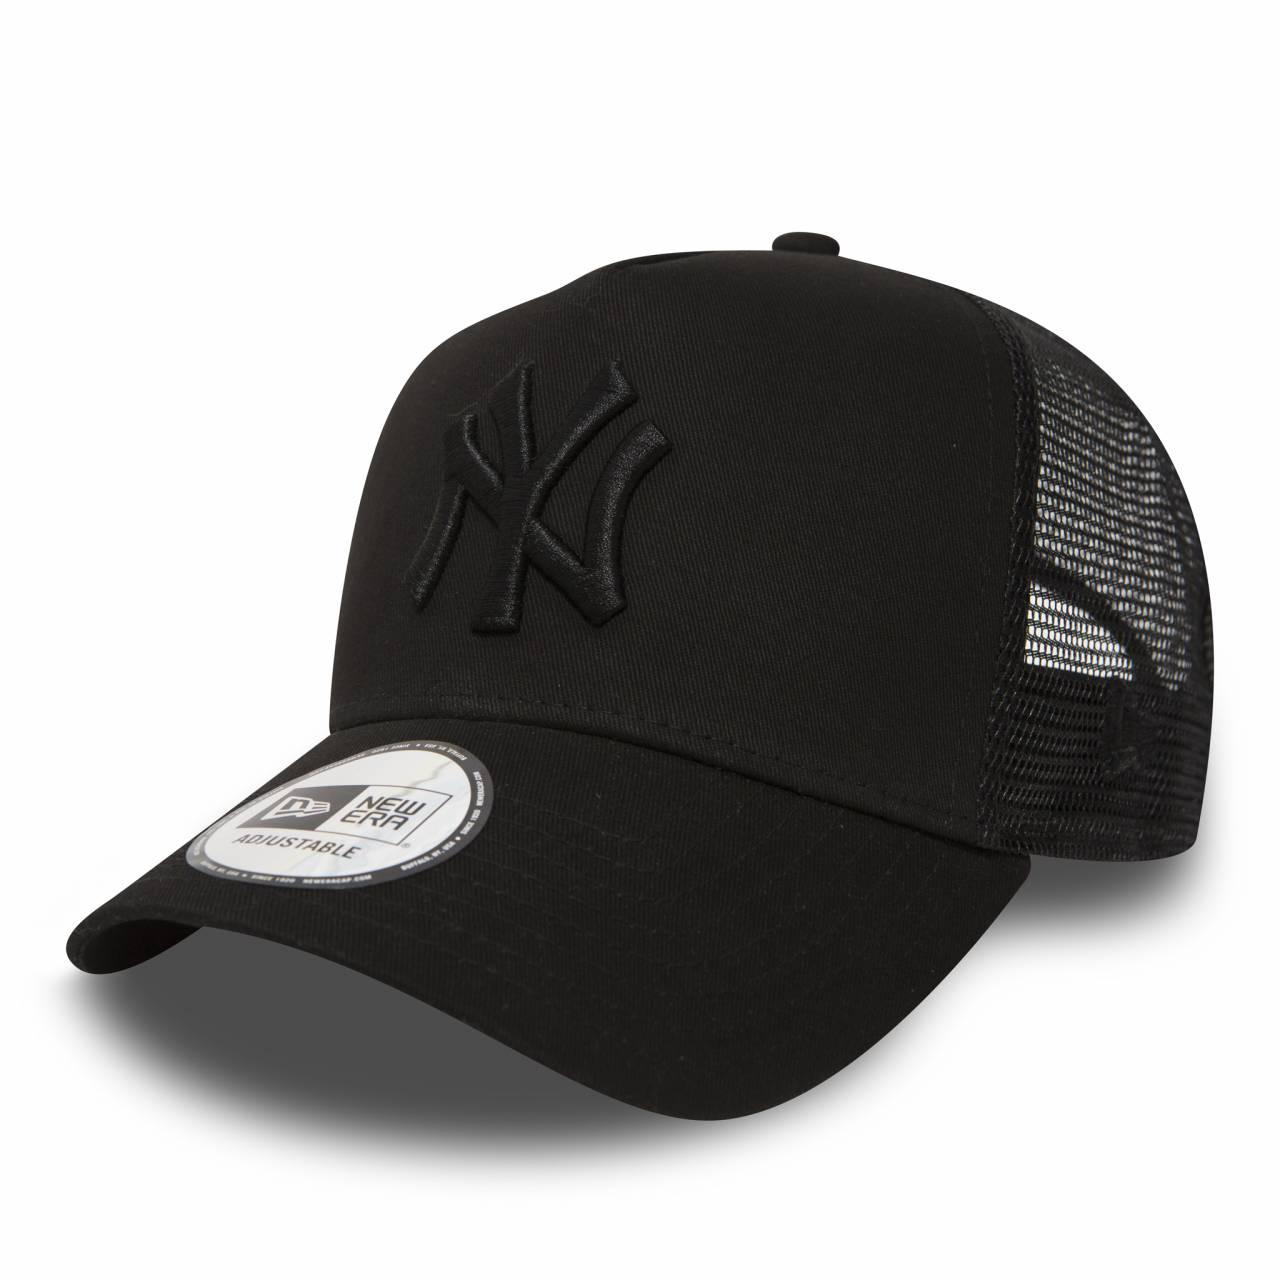 11579474 MLB TRUCKER NEW YORK YANKEES BLACK/BLACK CAP